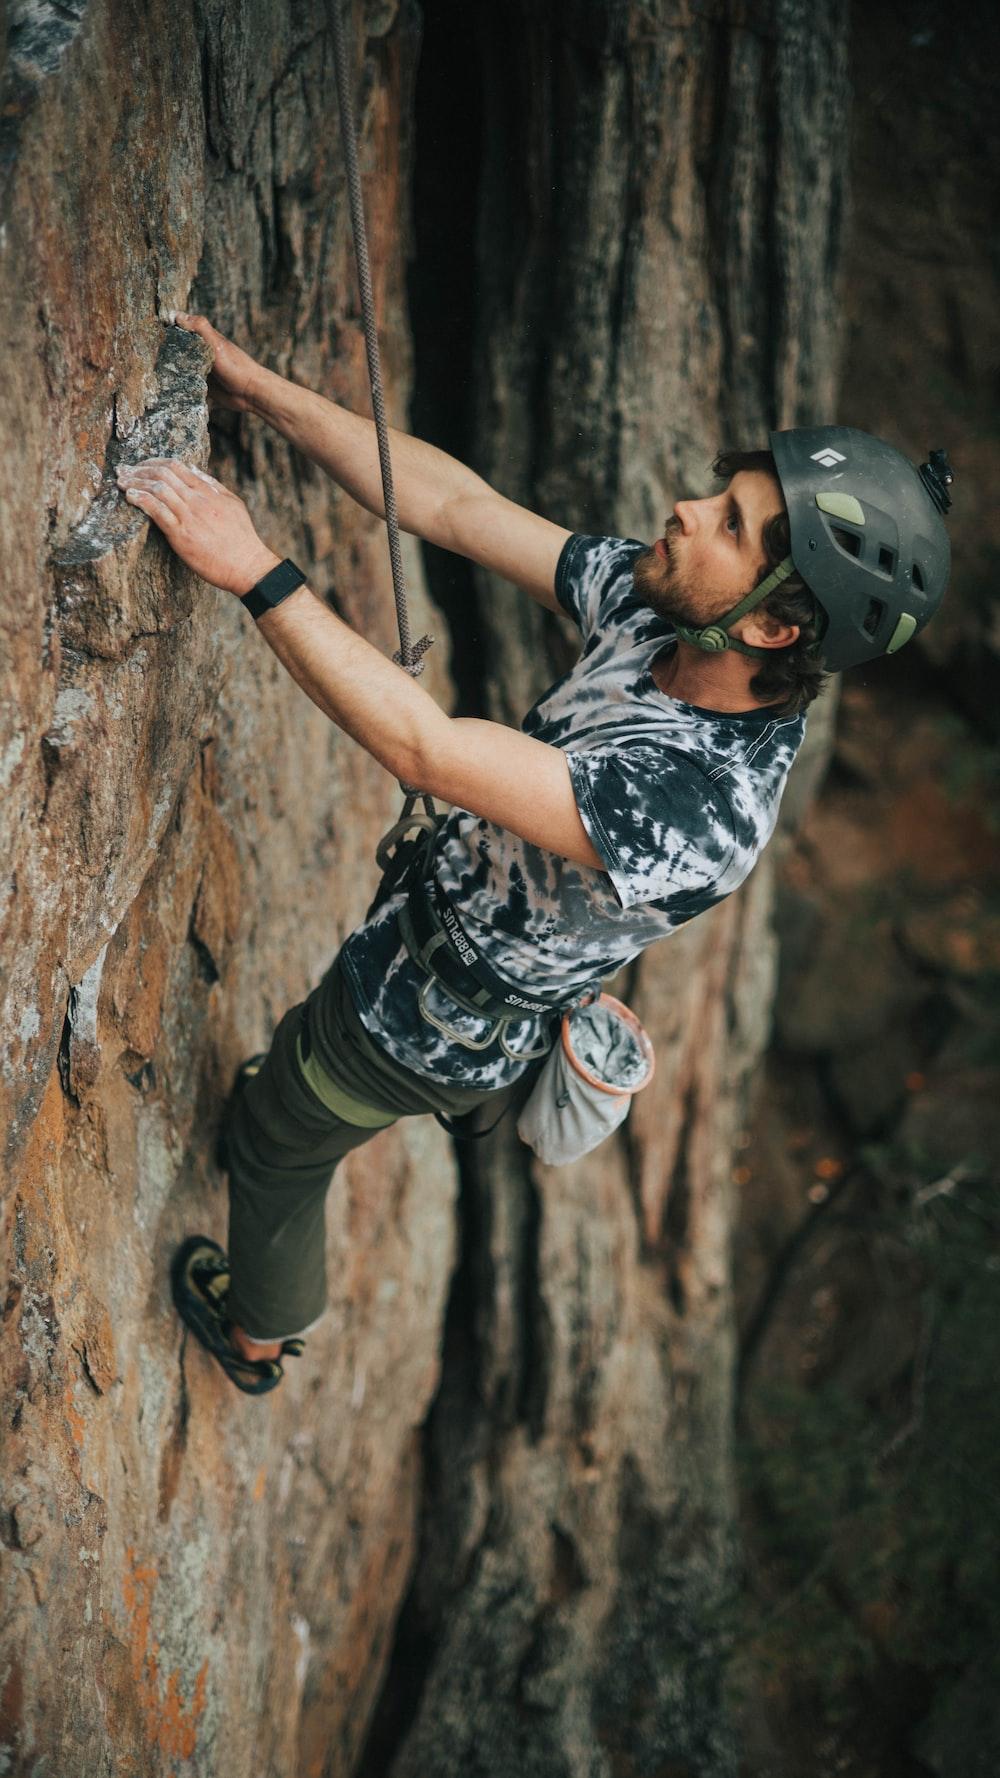 man in black helmet climbing on brown tree during daytime